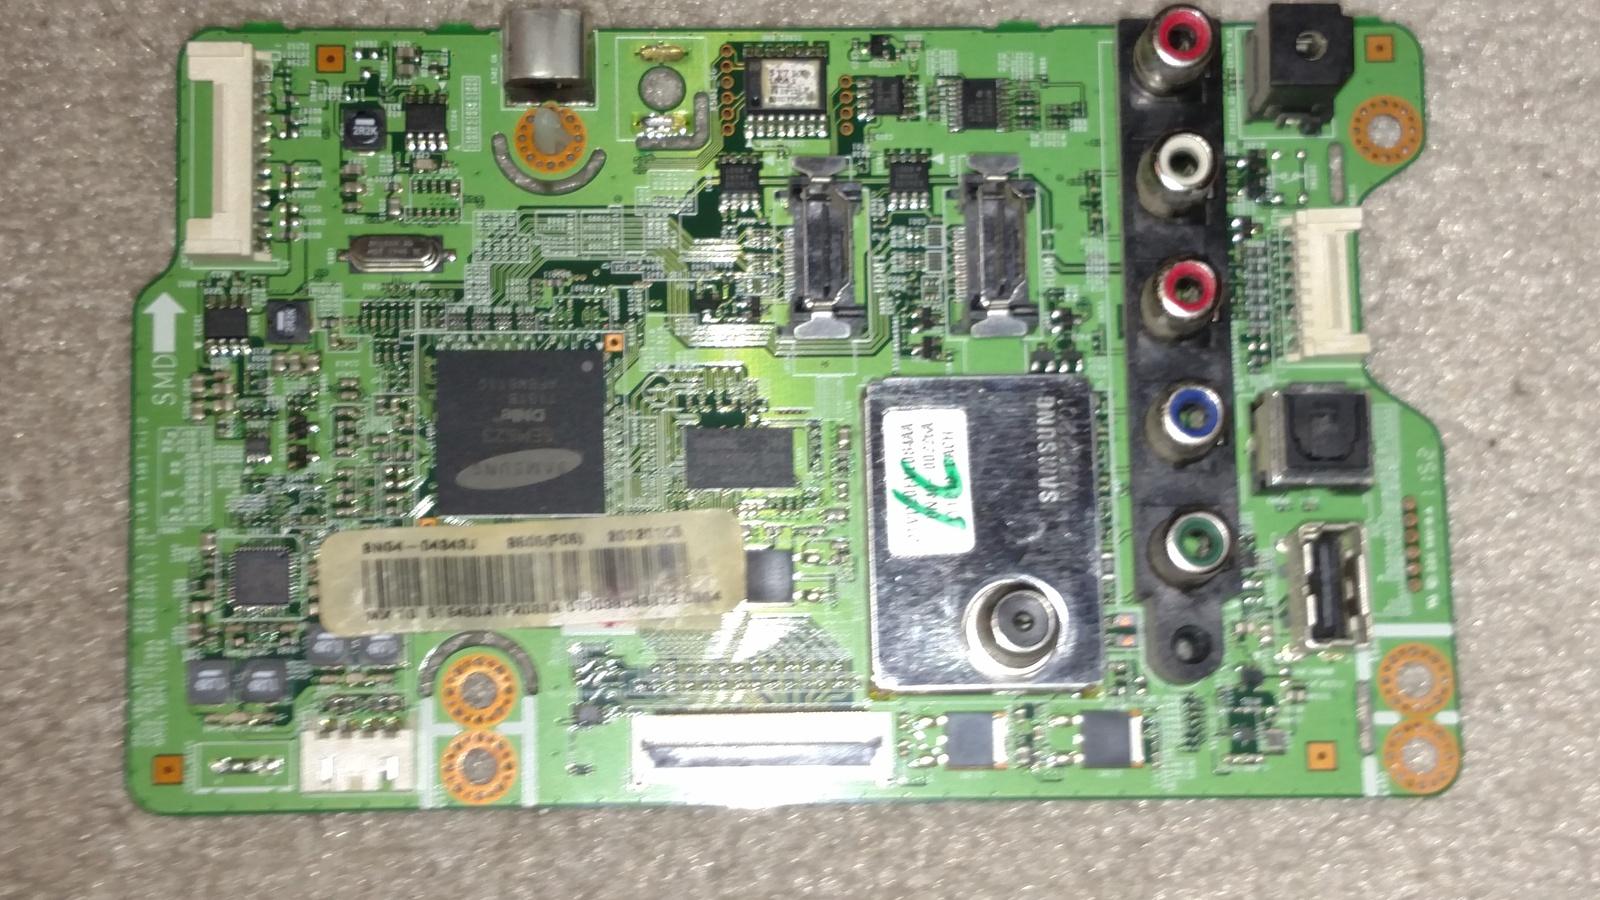 Samsung BN94-04343J (BN41-01799A, and similar items